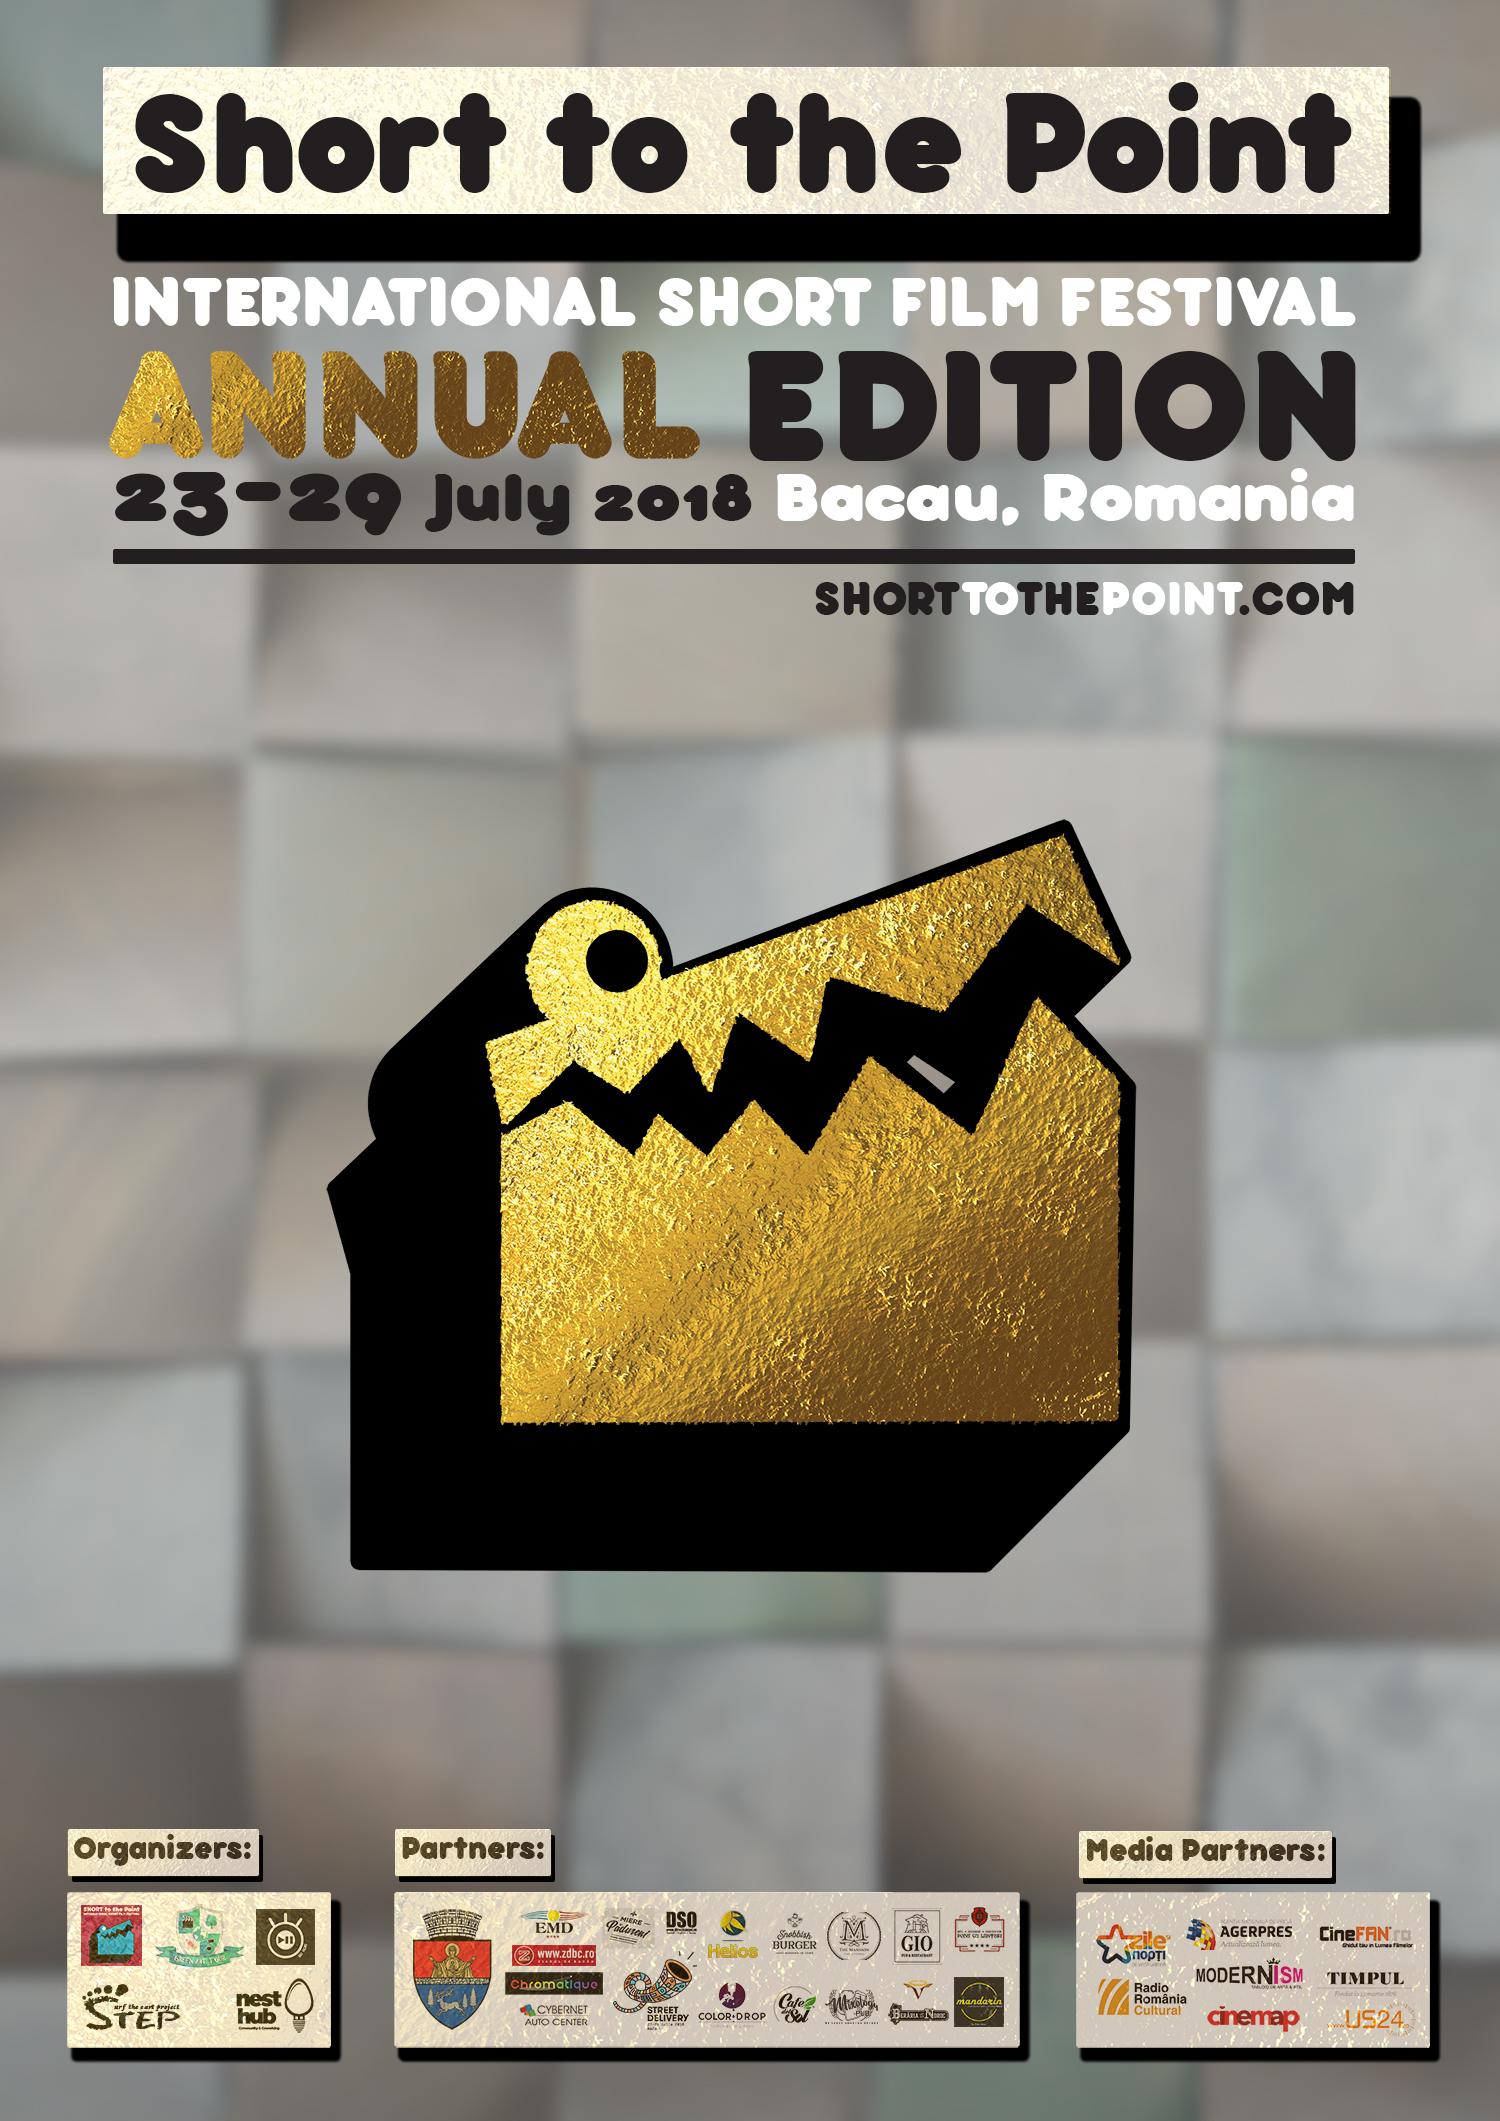 [RO] Comunicat de presa STTP Annual Edition 23-29 Iulie – Bacau, Romania